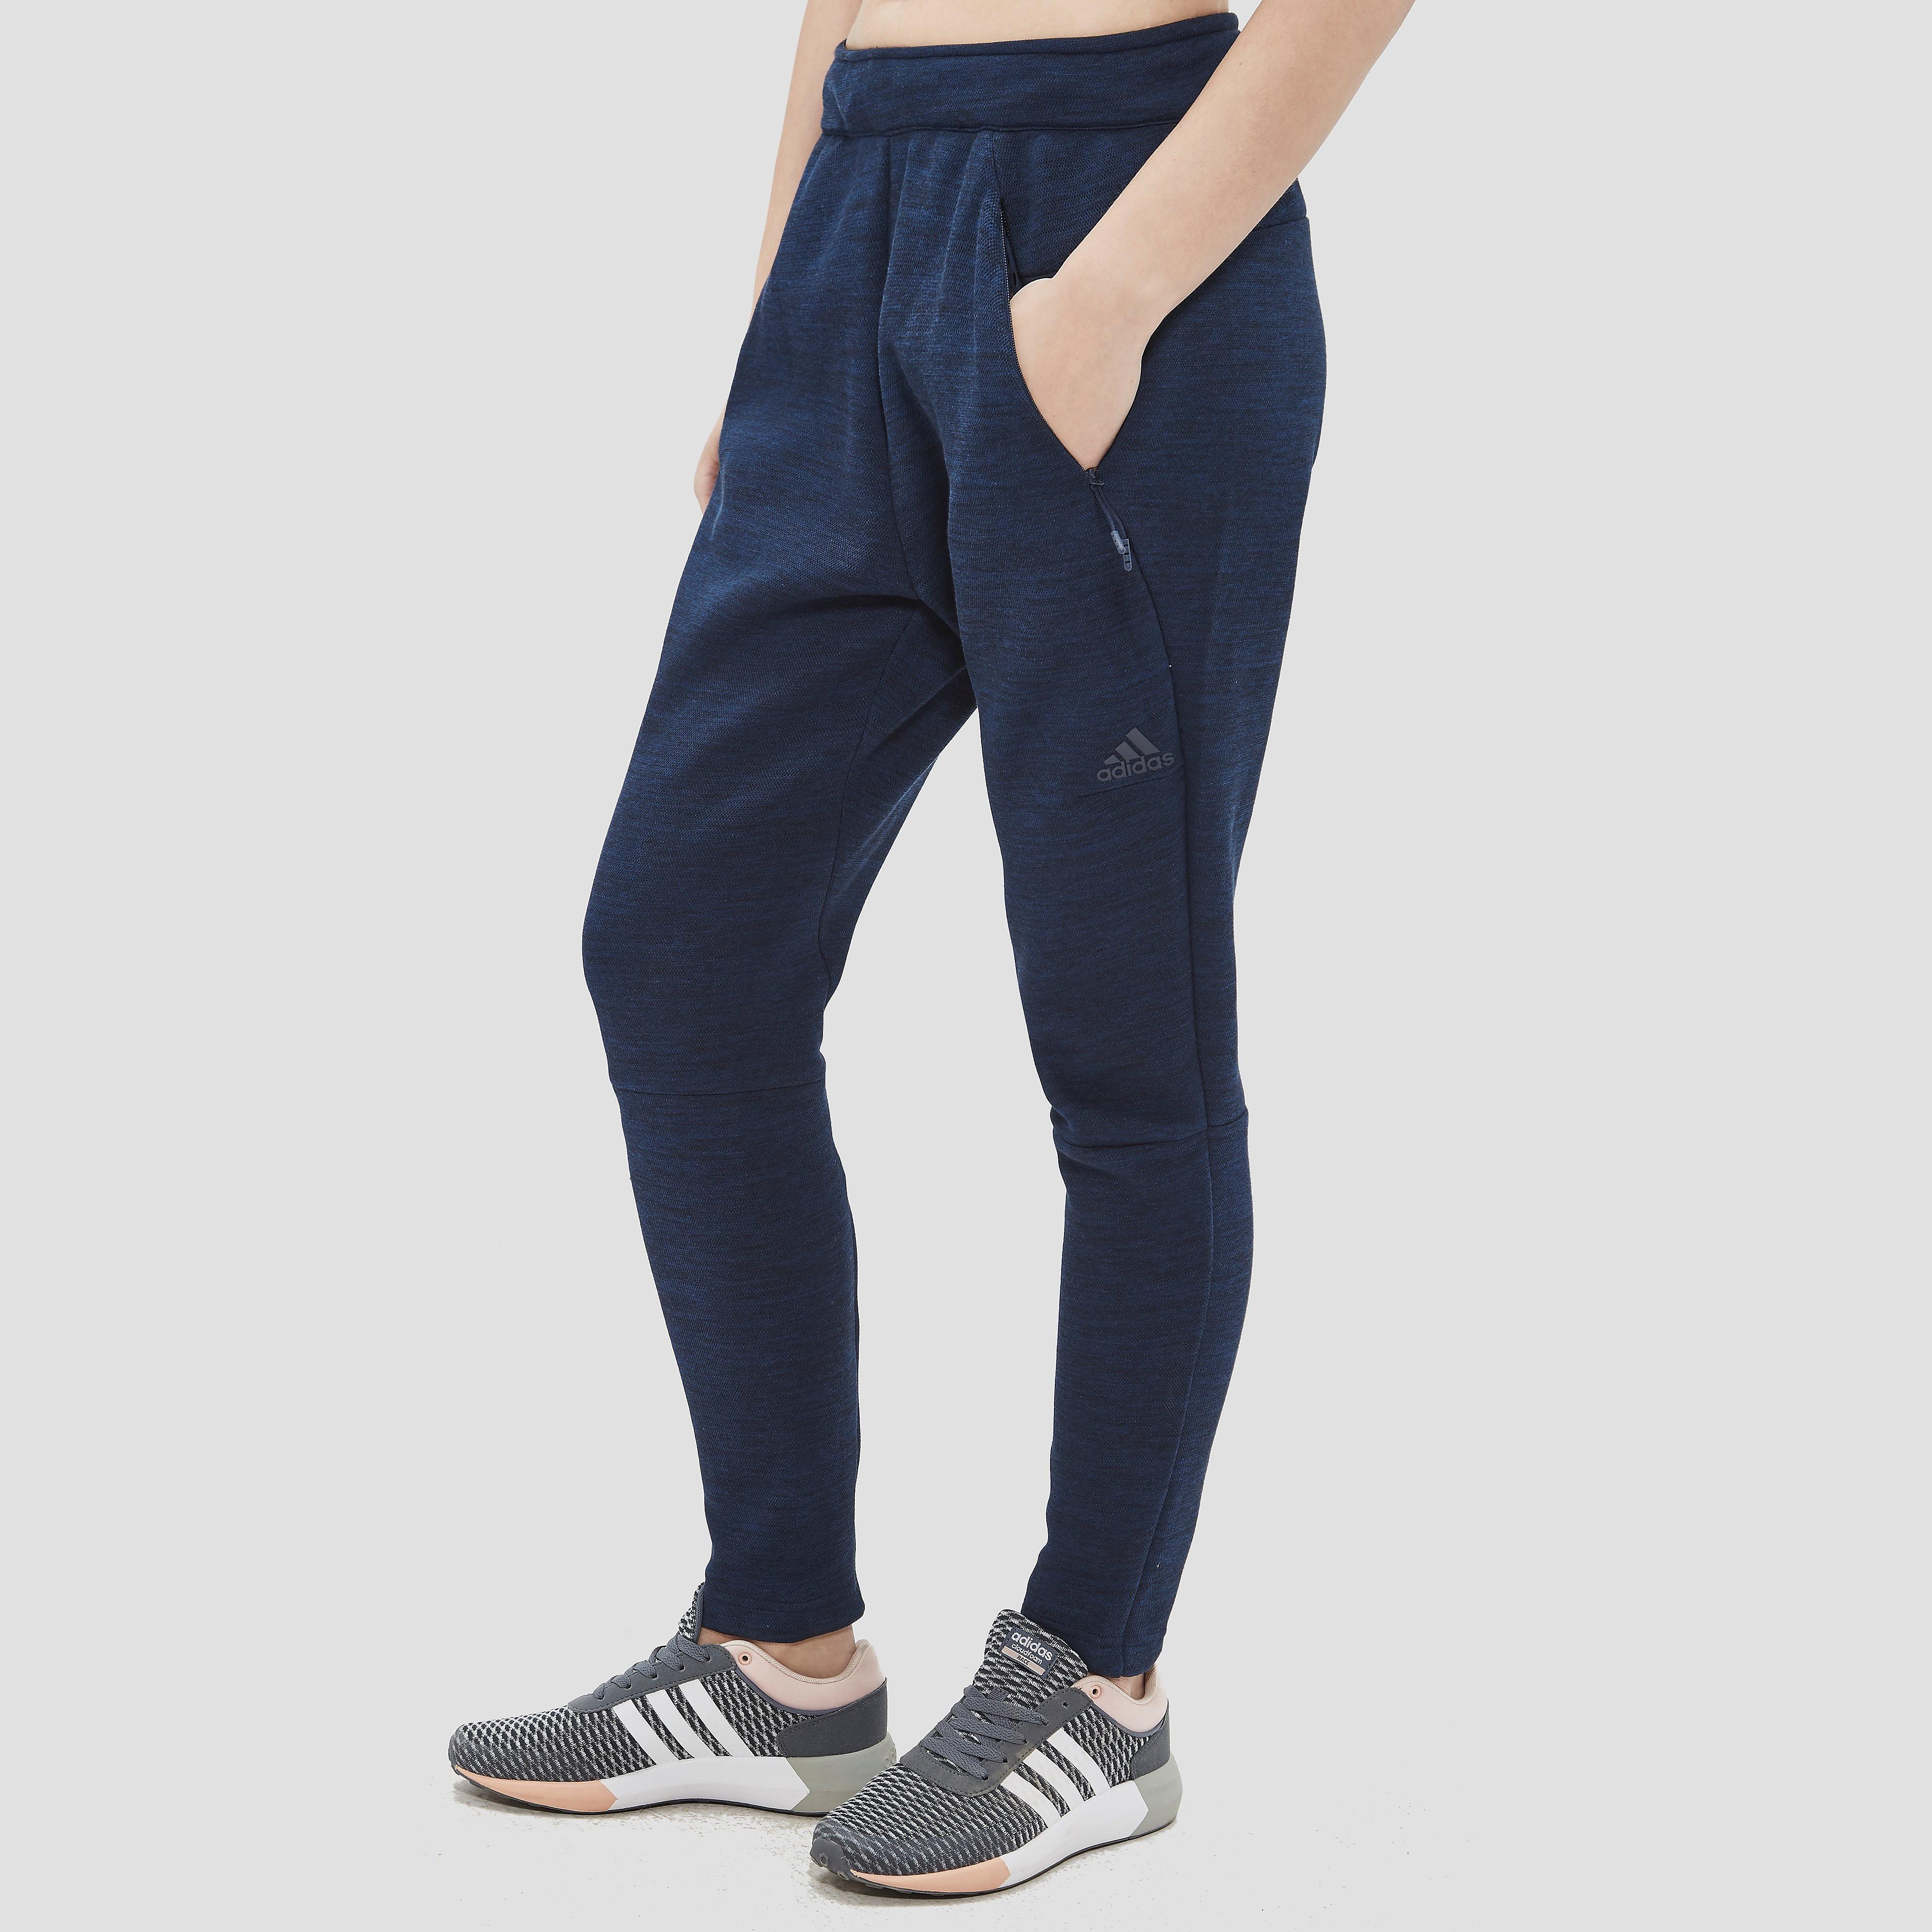 adidas Women's ZNE Travel Jogging Pants Navy M